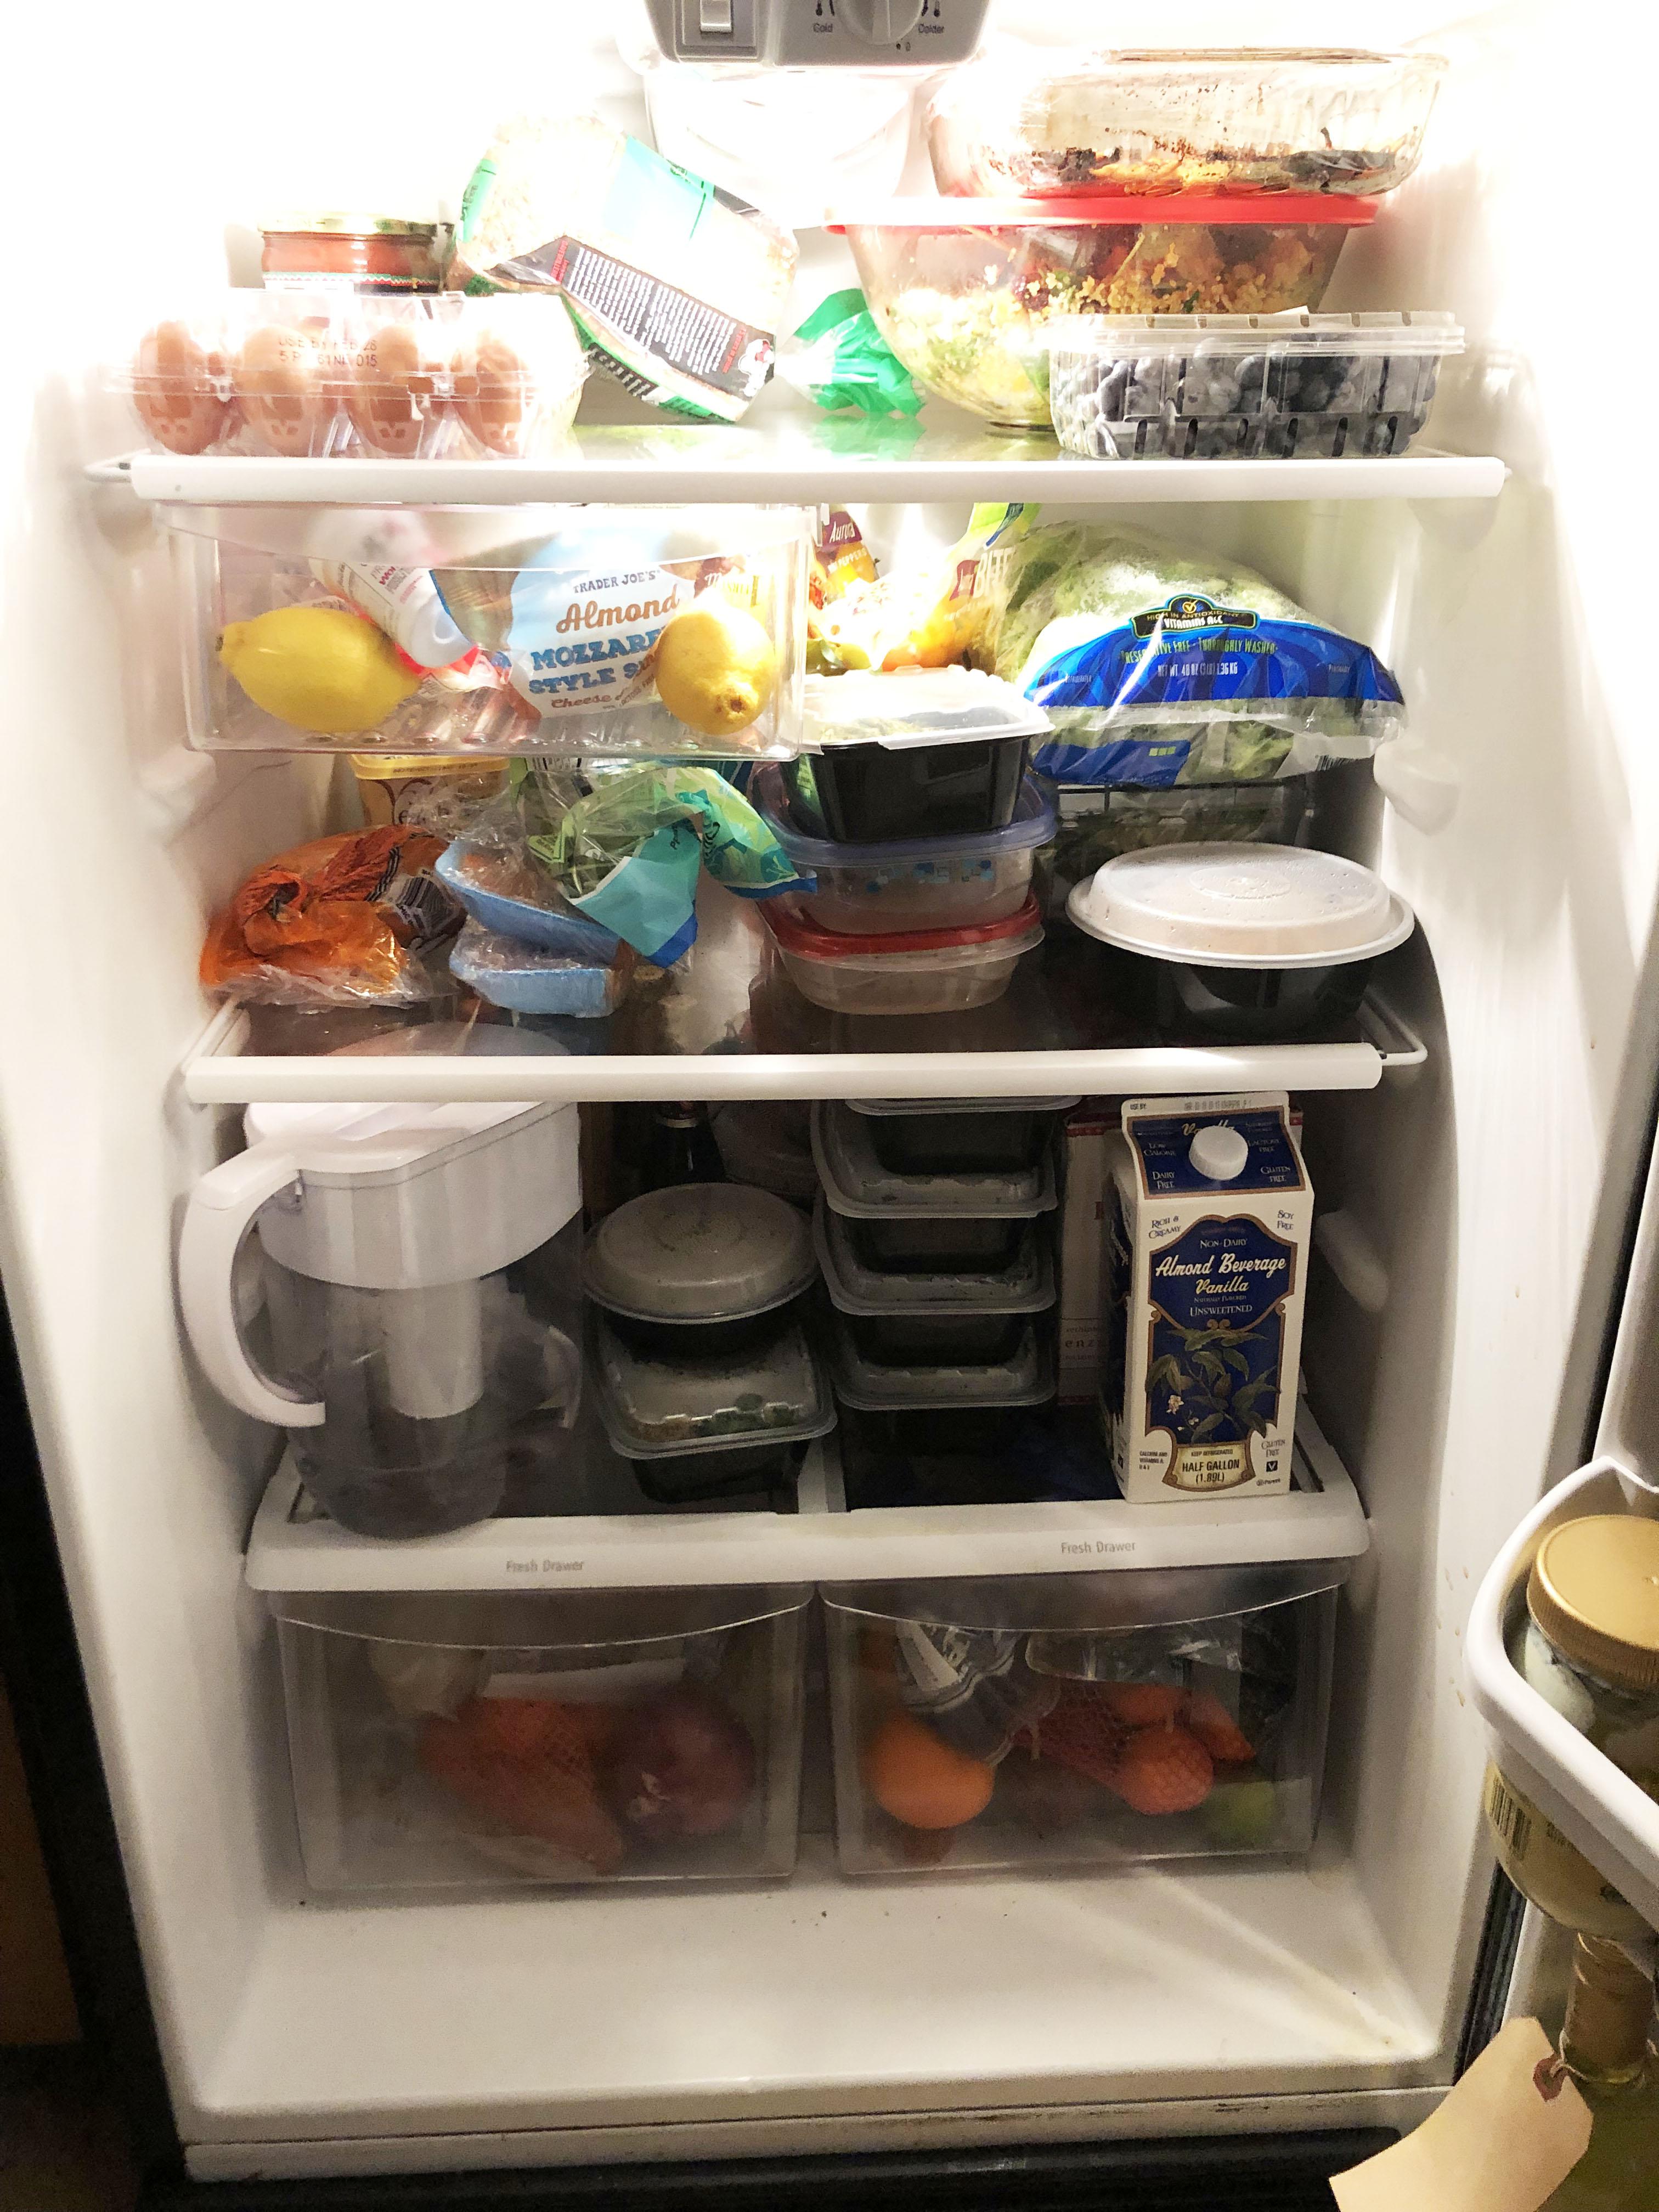 fridge full of healthy foods